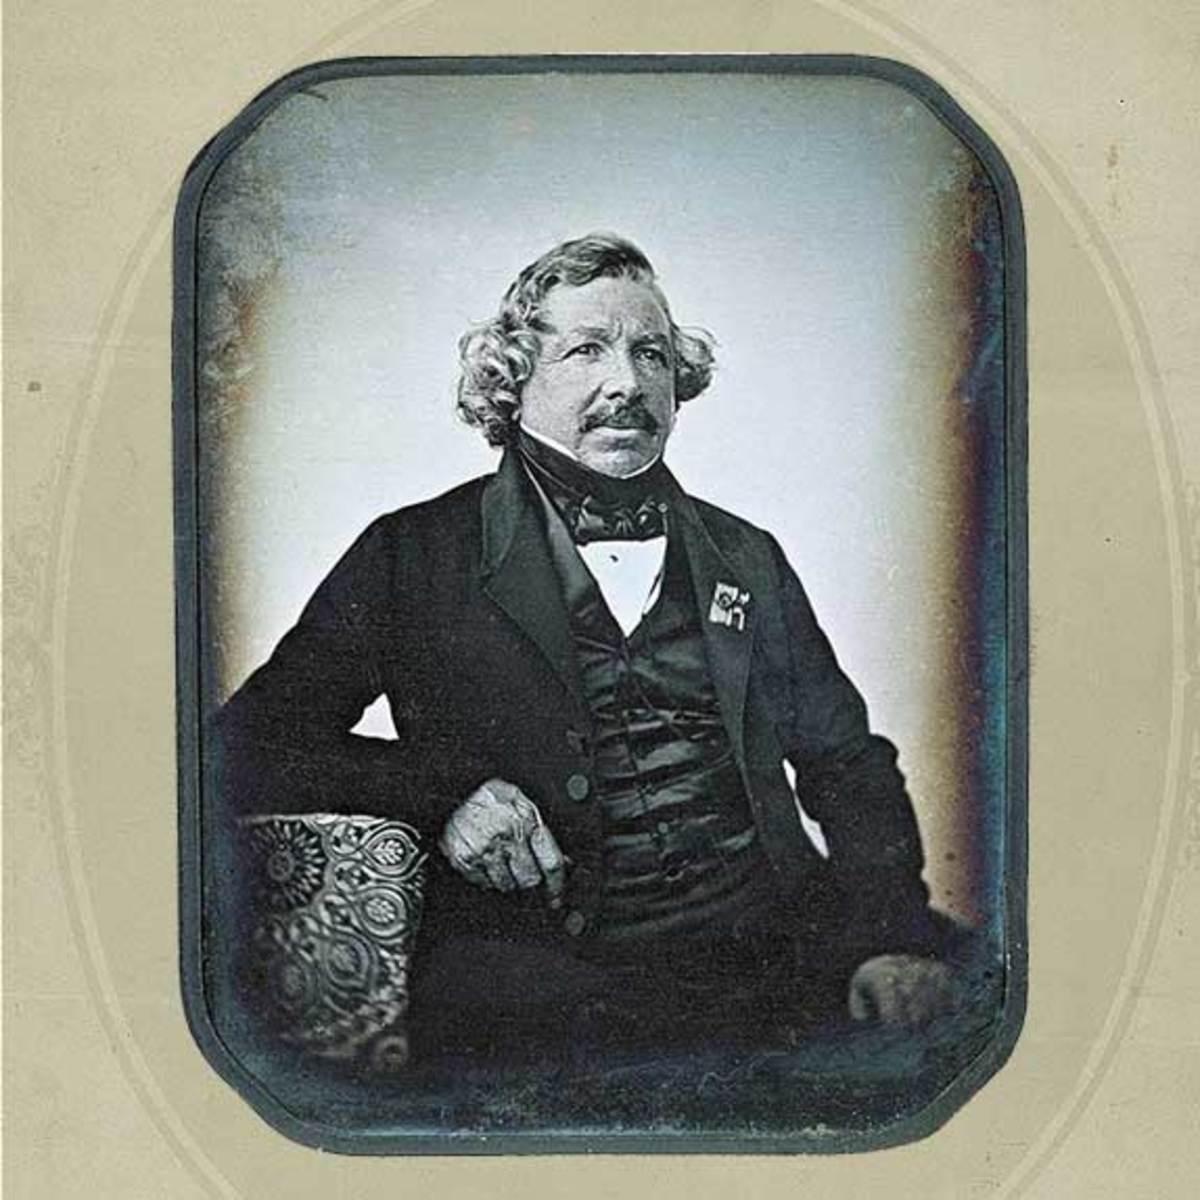 Louis Dagger's own photo taken by Jean-Baptiste Sabatiye-Blow